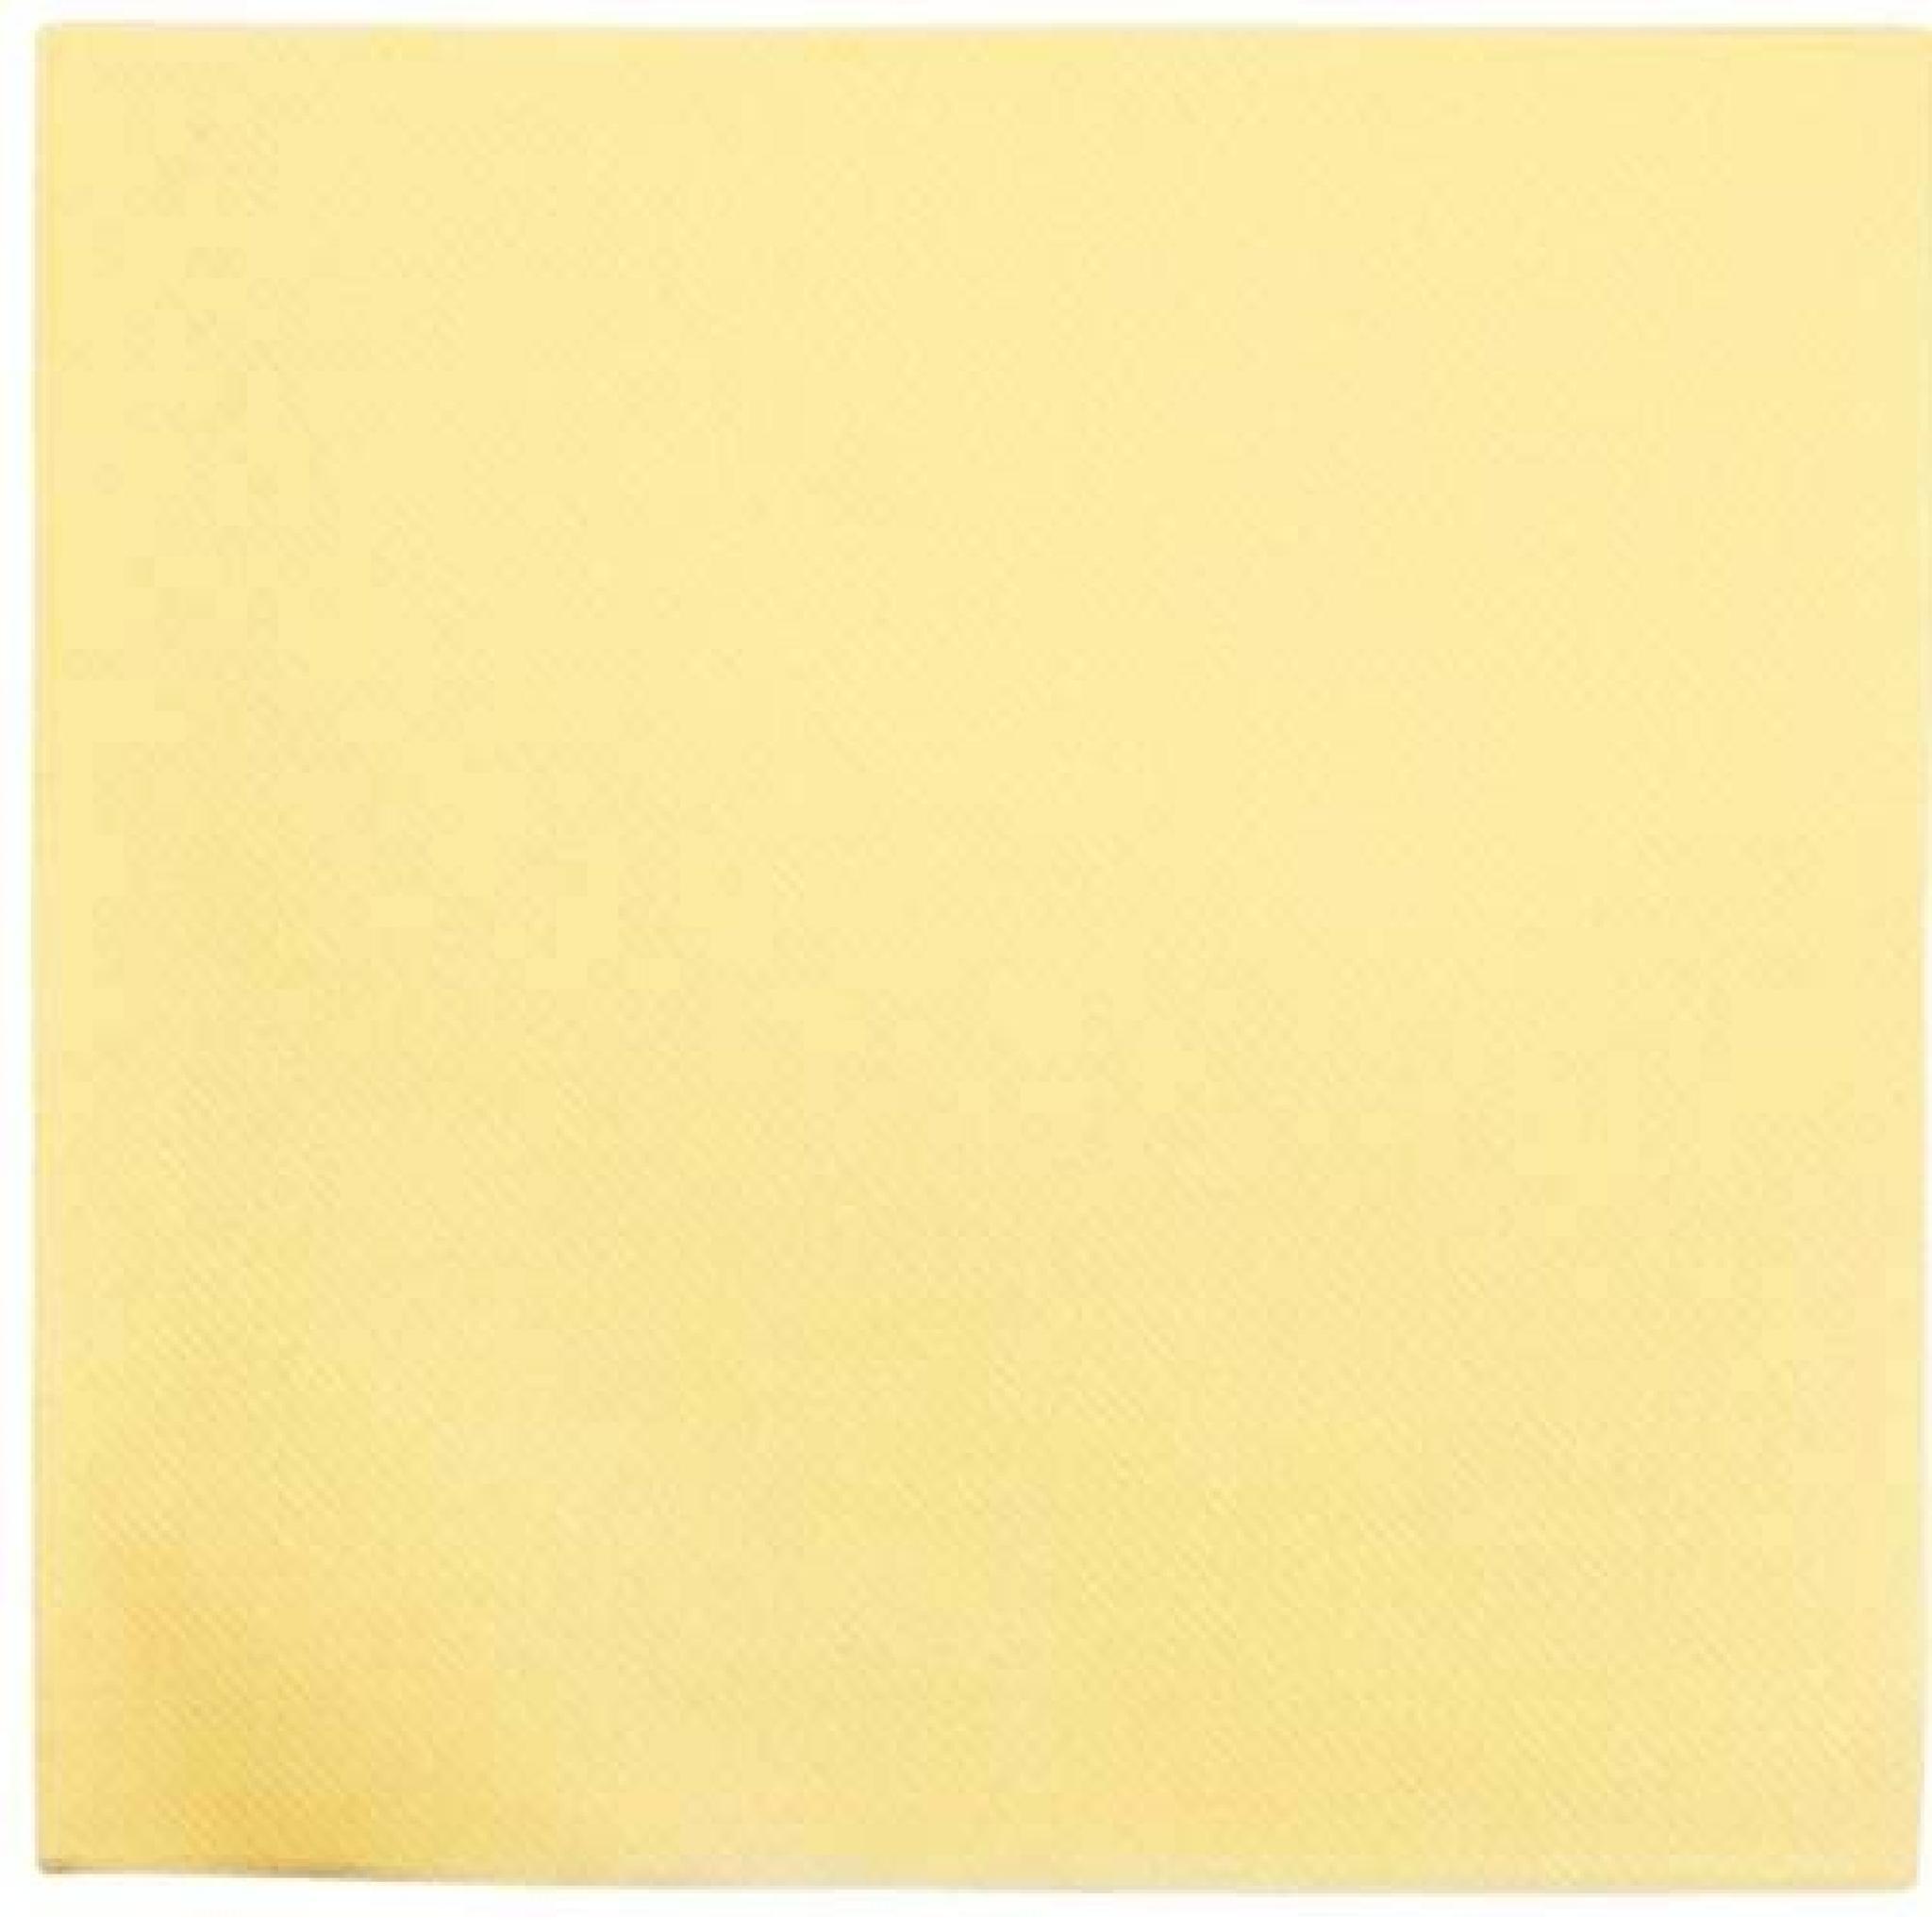 50 x Navy Blue Tablin Airlaid Paper Preminum Napkins 40cm Linen Feel Serviettes